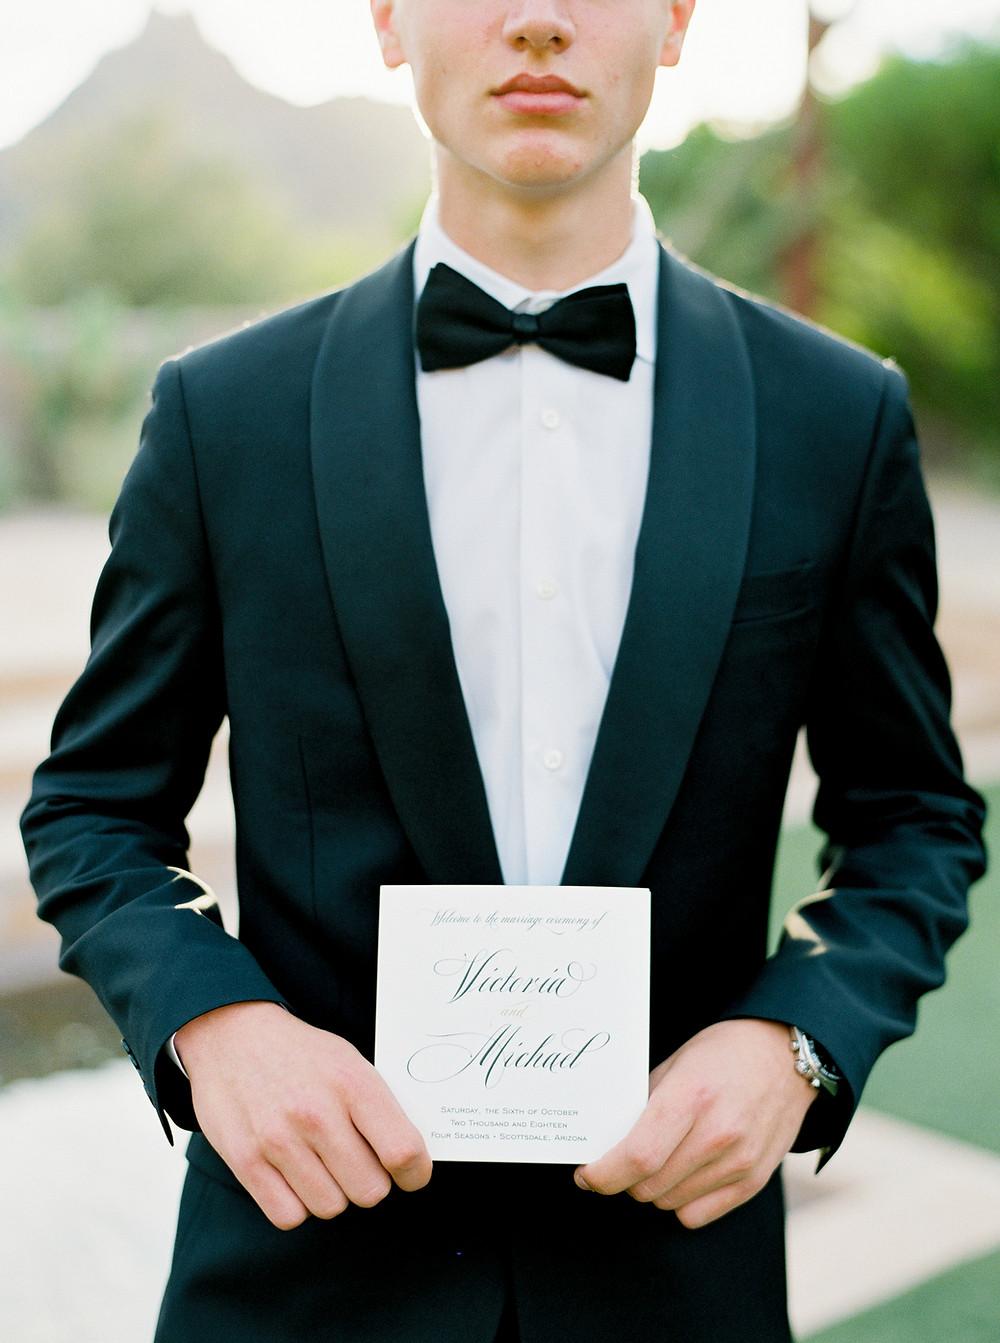 wedding usher